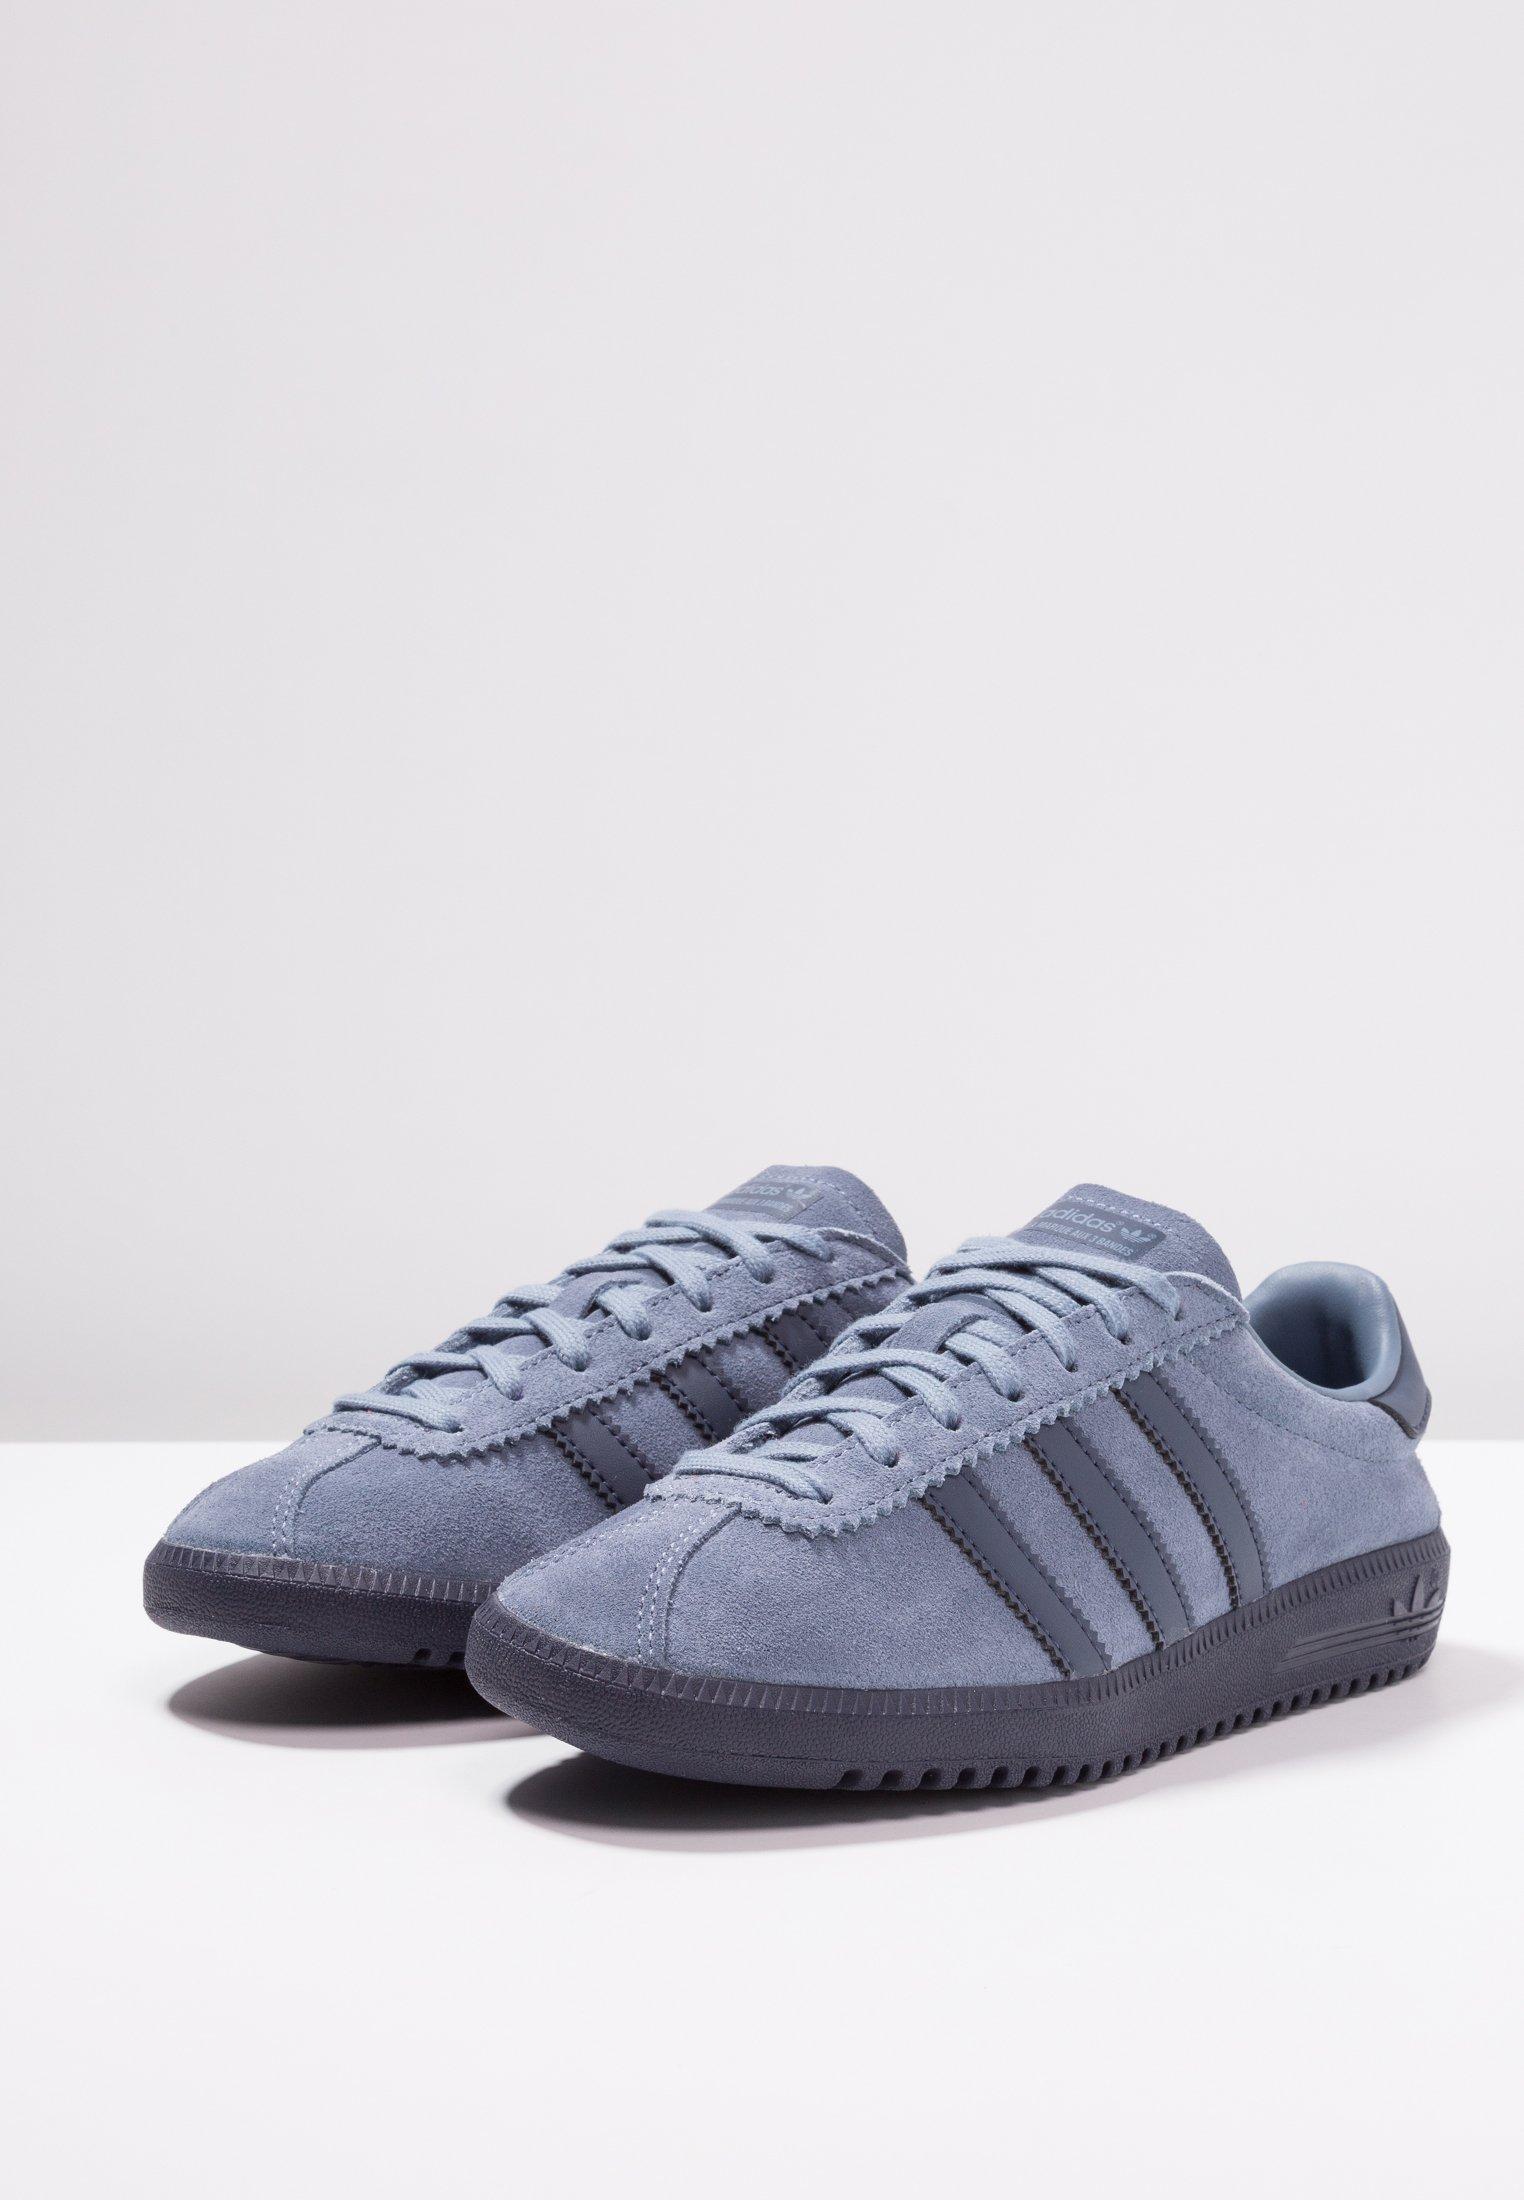 BermudaBaskets Adidas Raw Blue Basses Steel trace Originals tsdxhQBorC